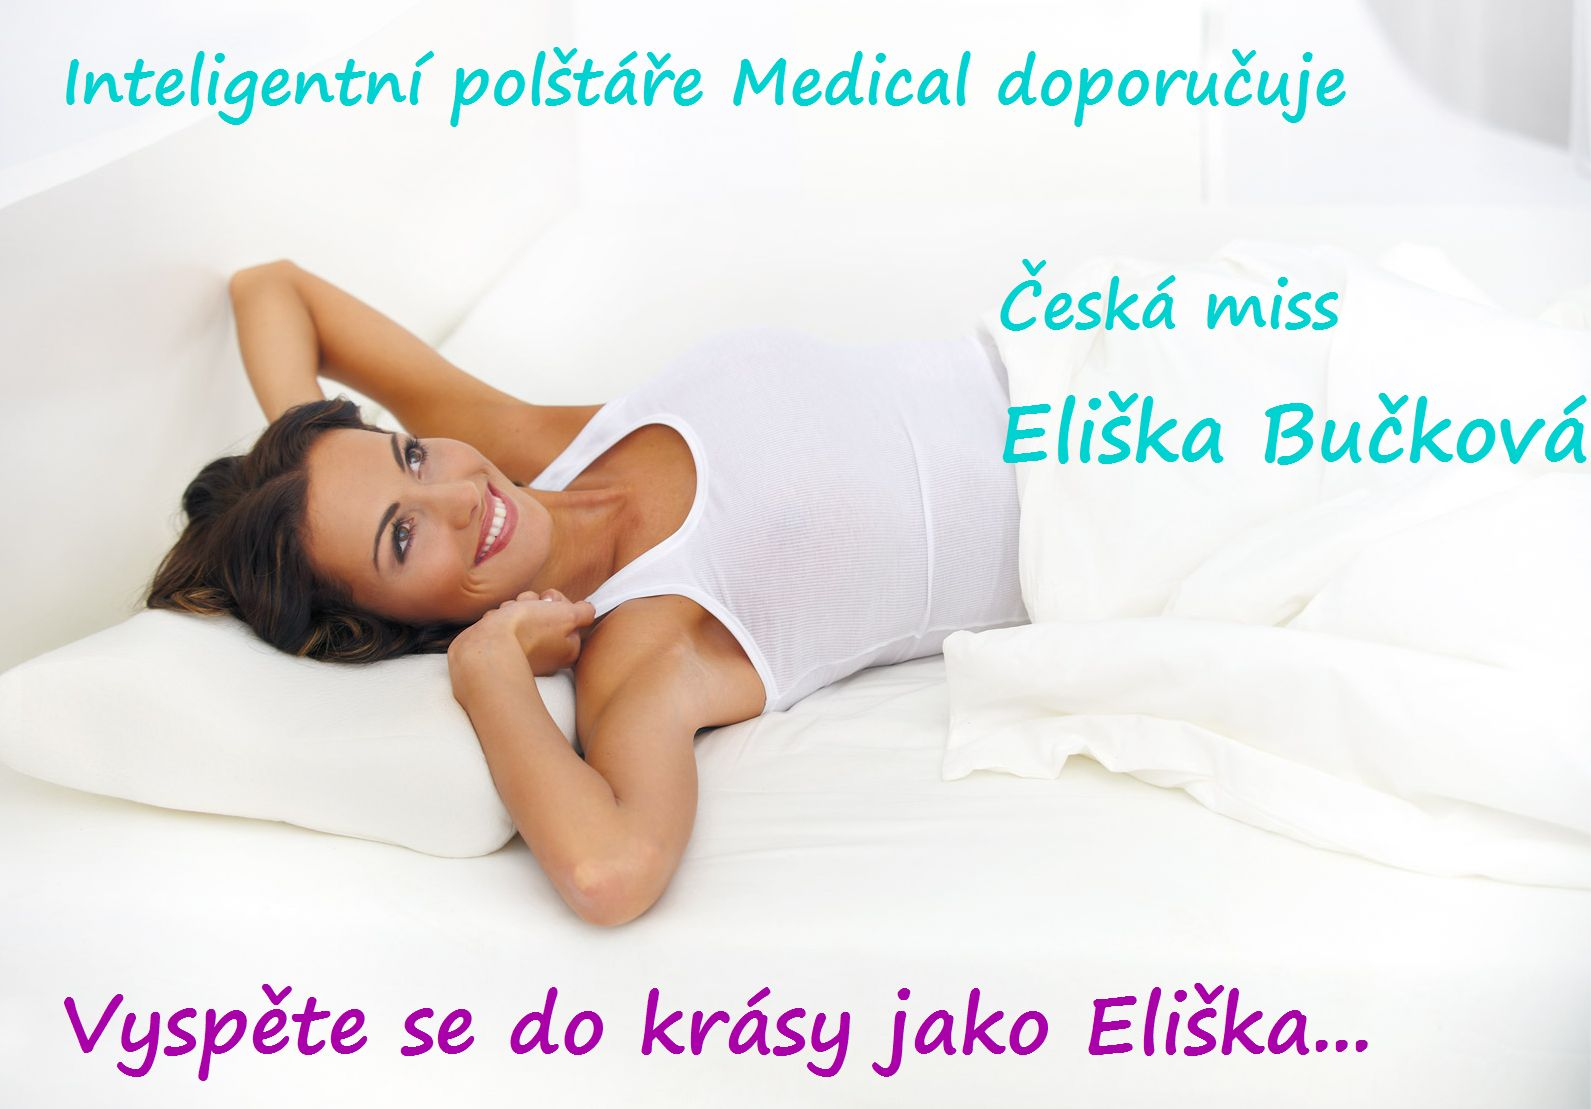 ceska-miss-2013-polstare-z-pametove-anatomicke-peny.jpg